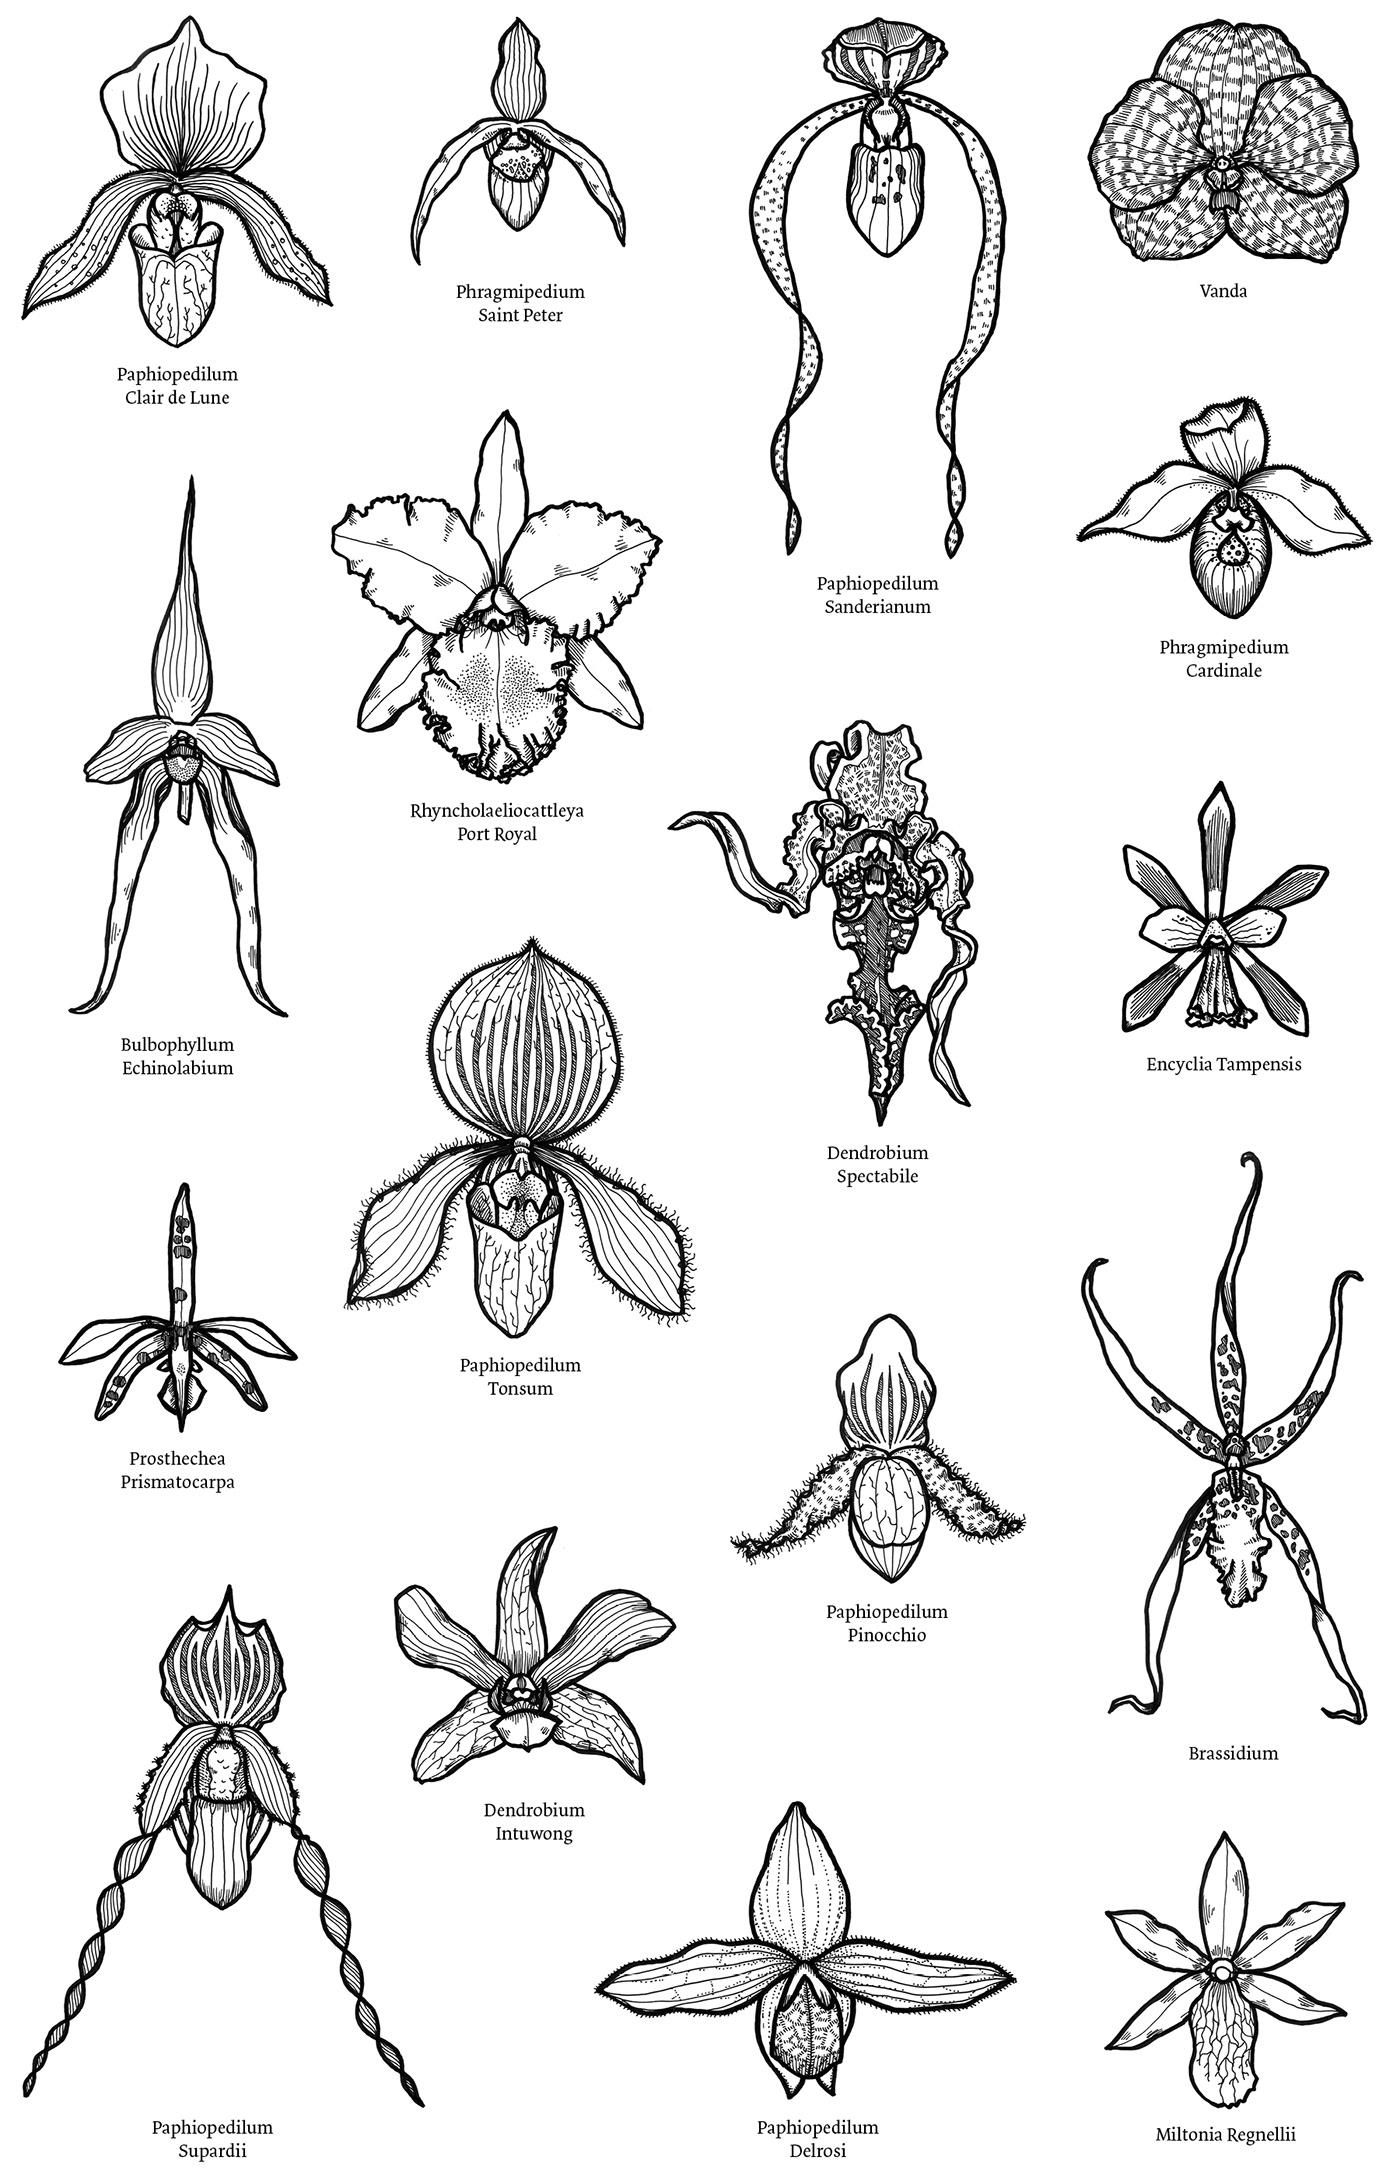 orchids orchid botanical botanical illustration scientific scientific illustration black and white Flowers flower Flora